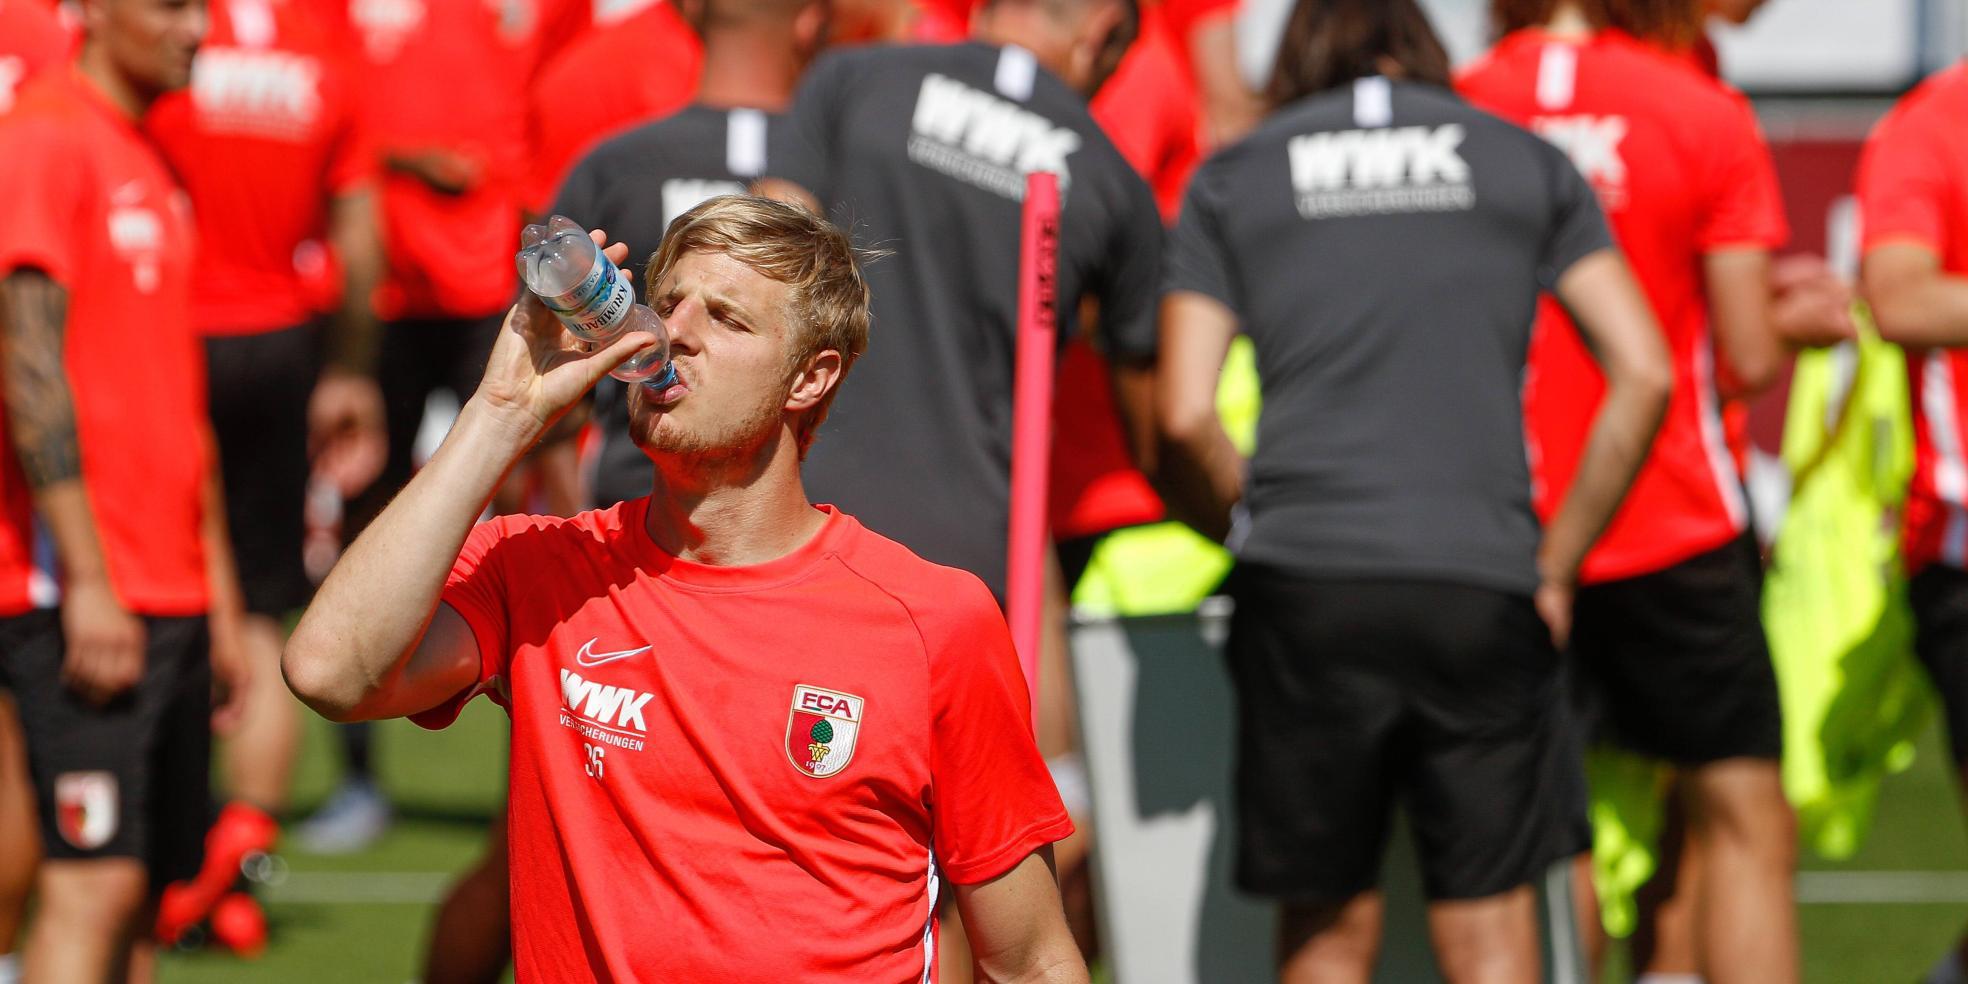 Martin Hinteregger vom FC Augsburg